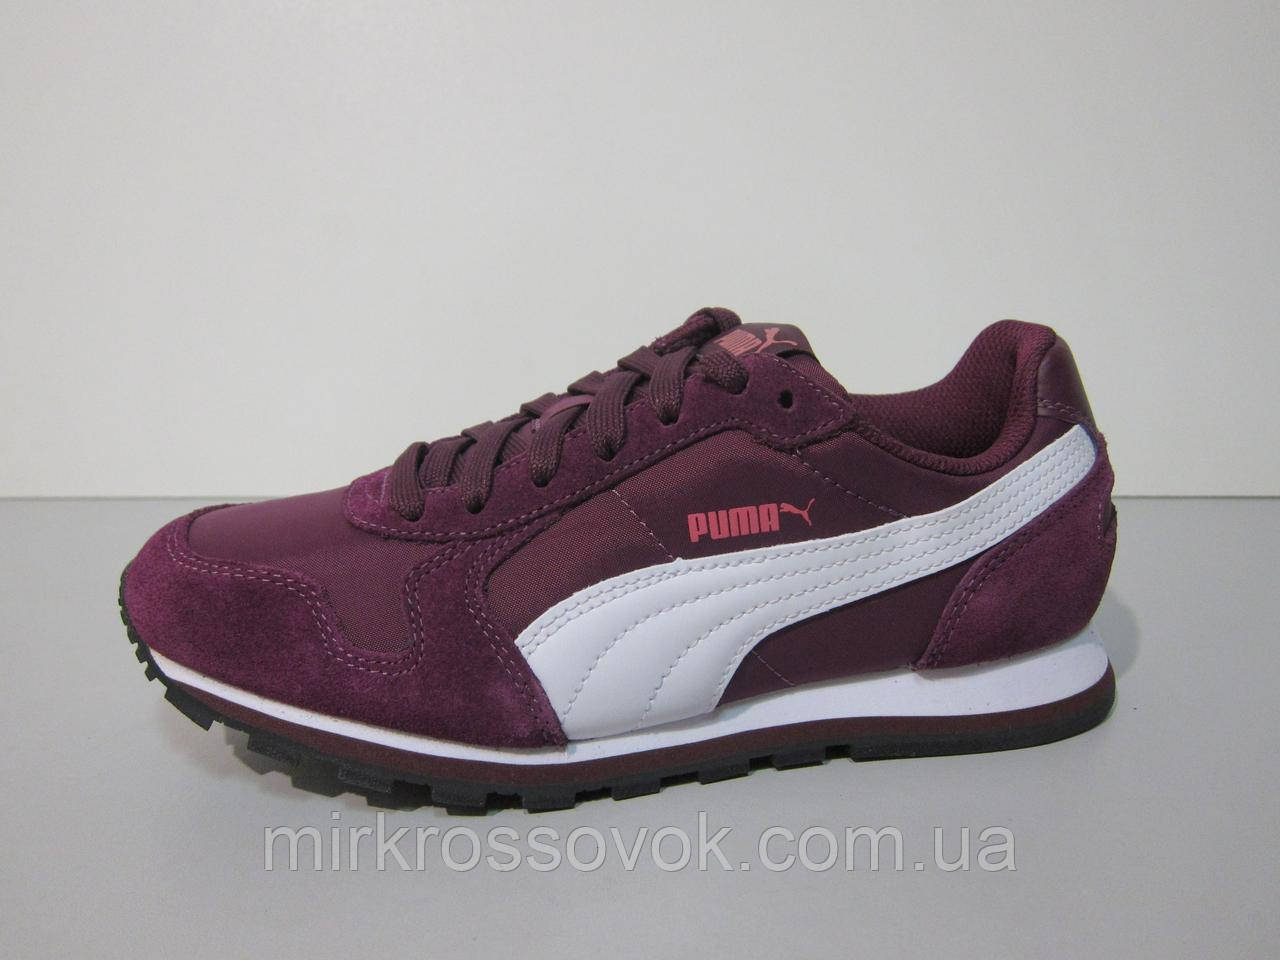 Кроссовки Puma RUNNER NL DARK PURPLE-PUMA WHITE (35673845) (оригинал ... 607c74e27e4